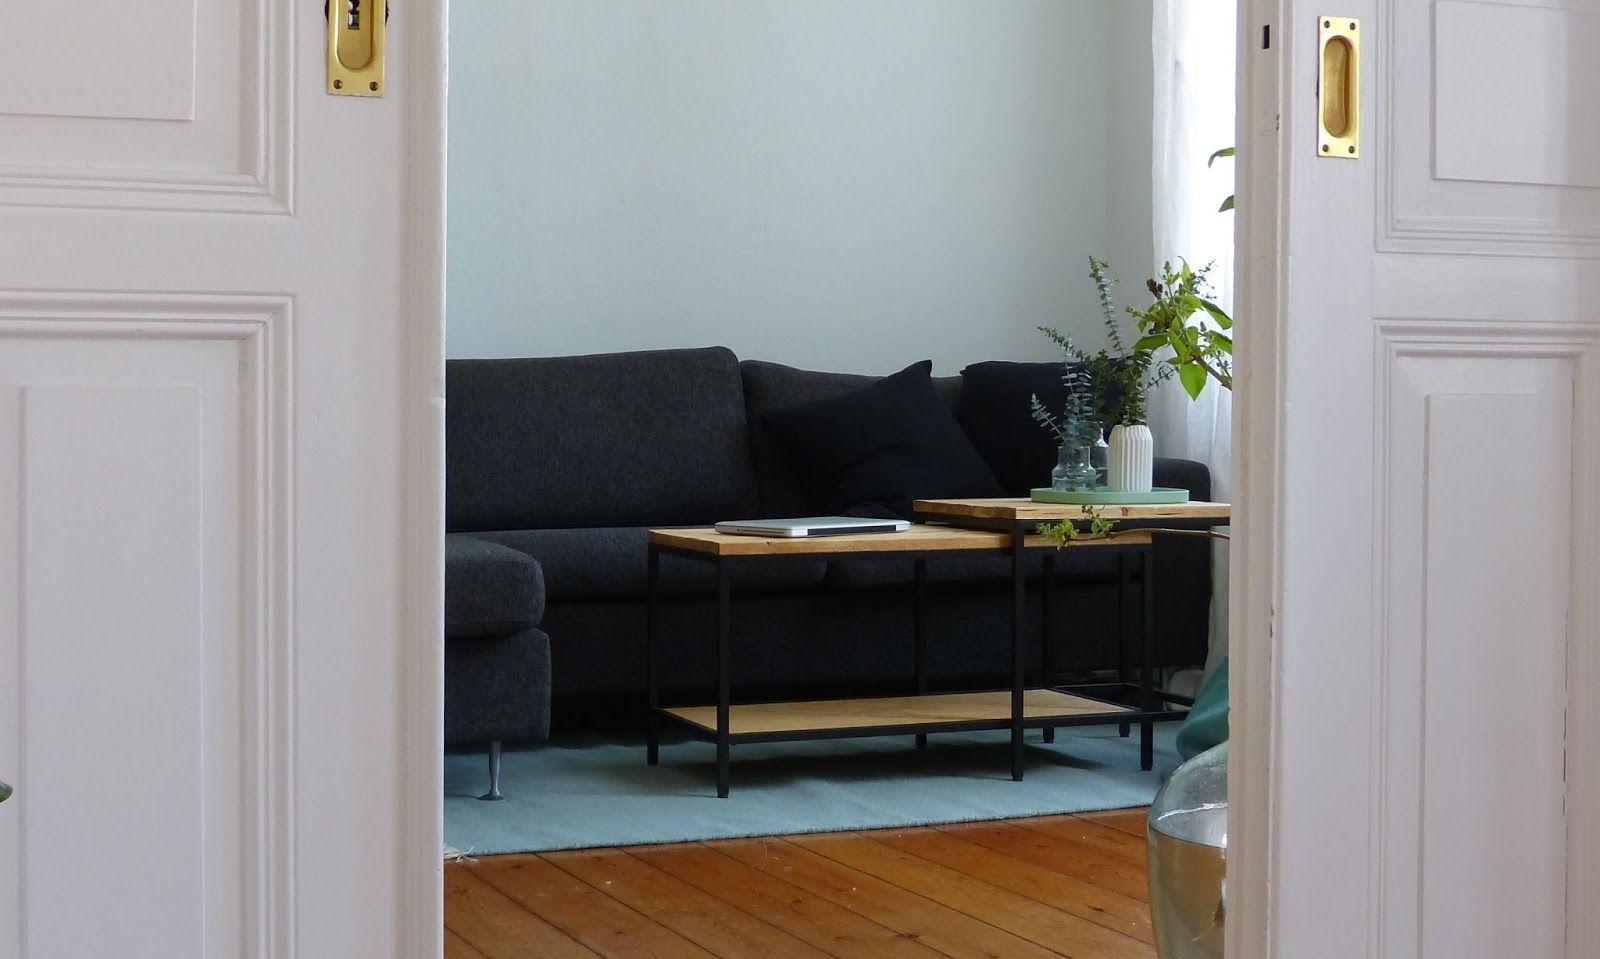 satztische swalif. Black Bedroom Furniture Sets. Home Design Ideas